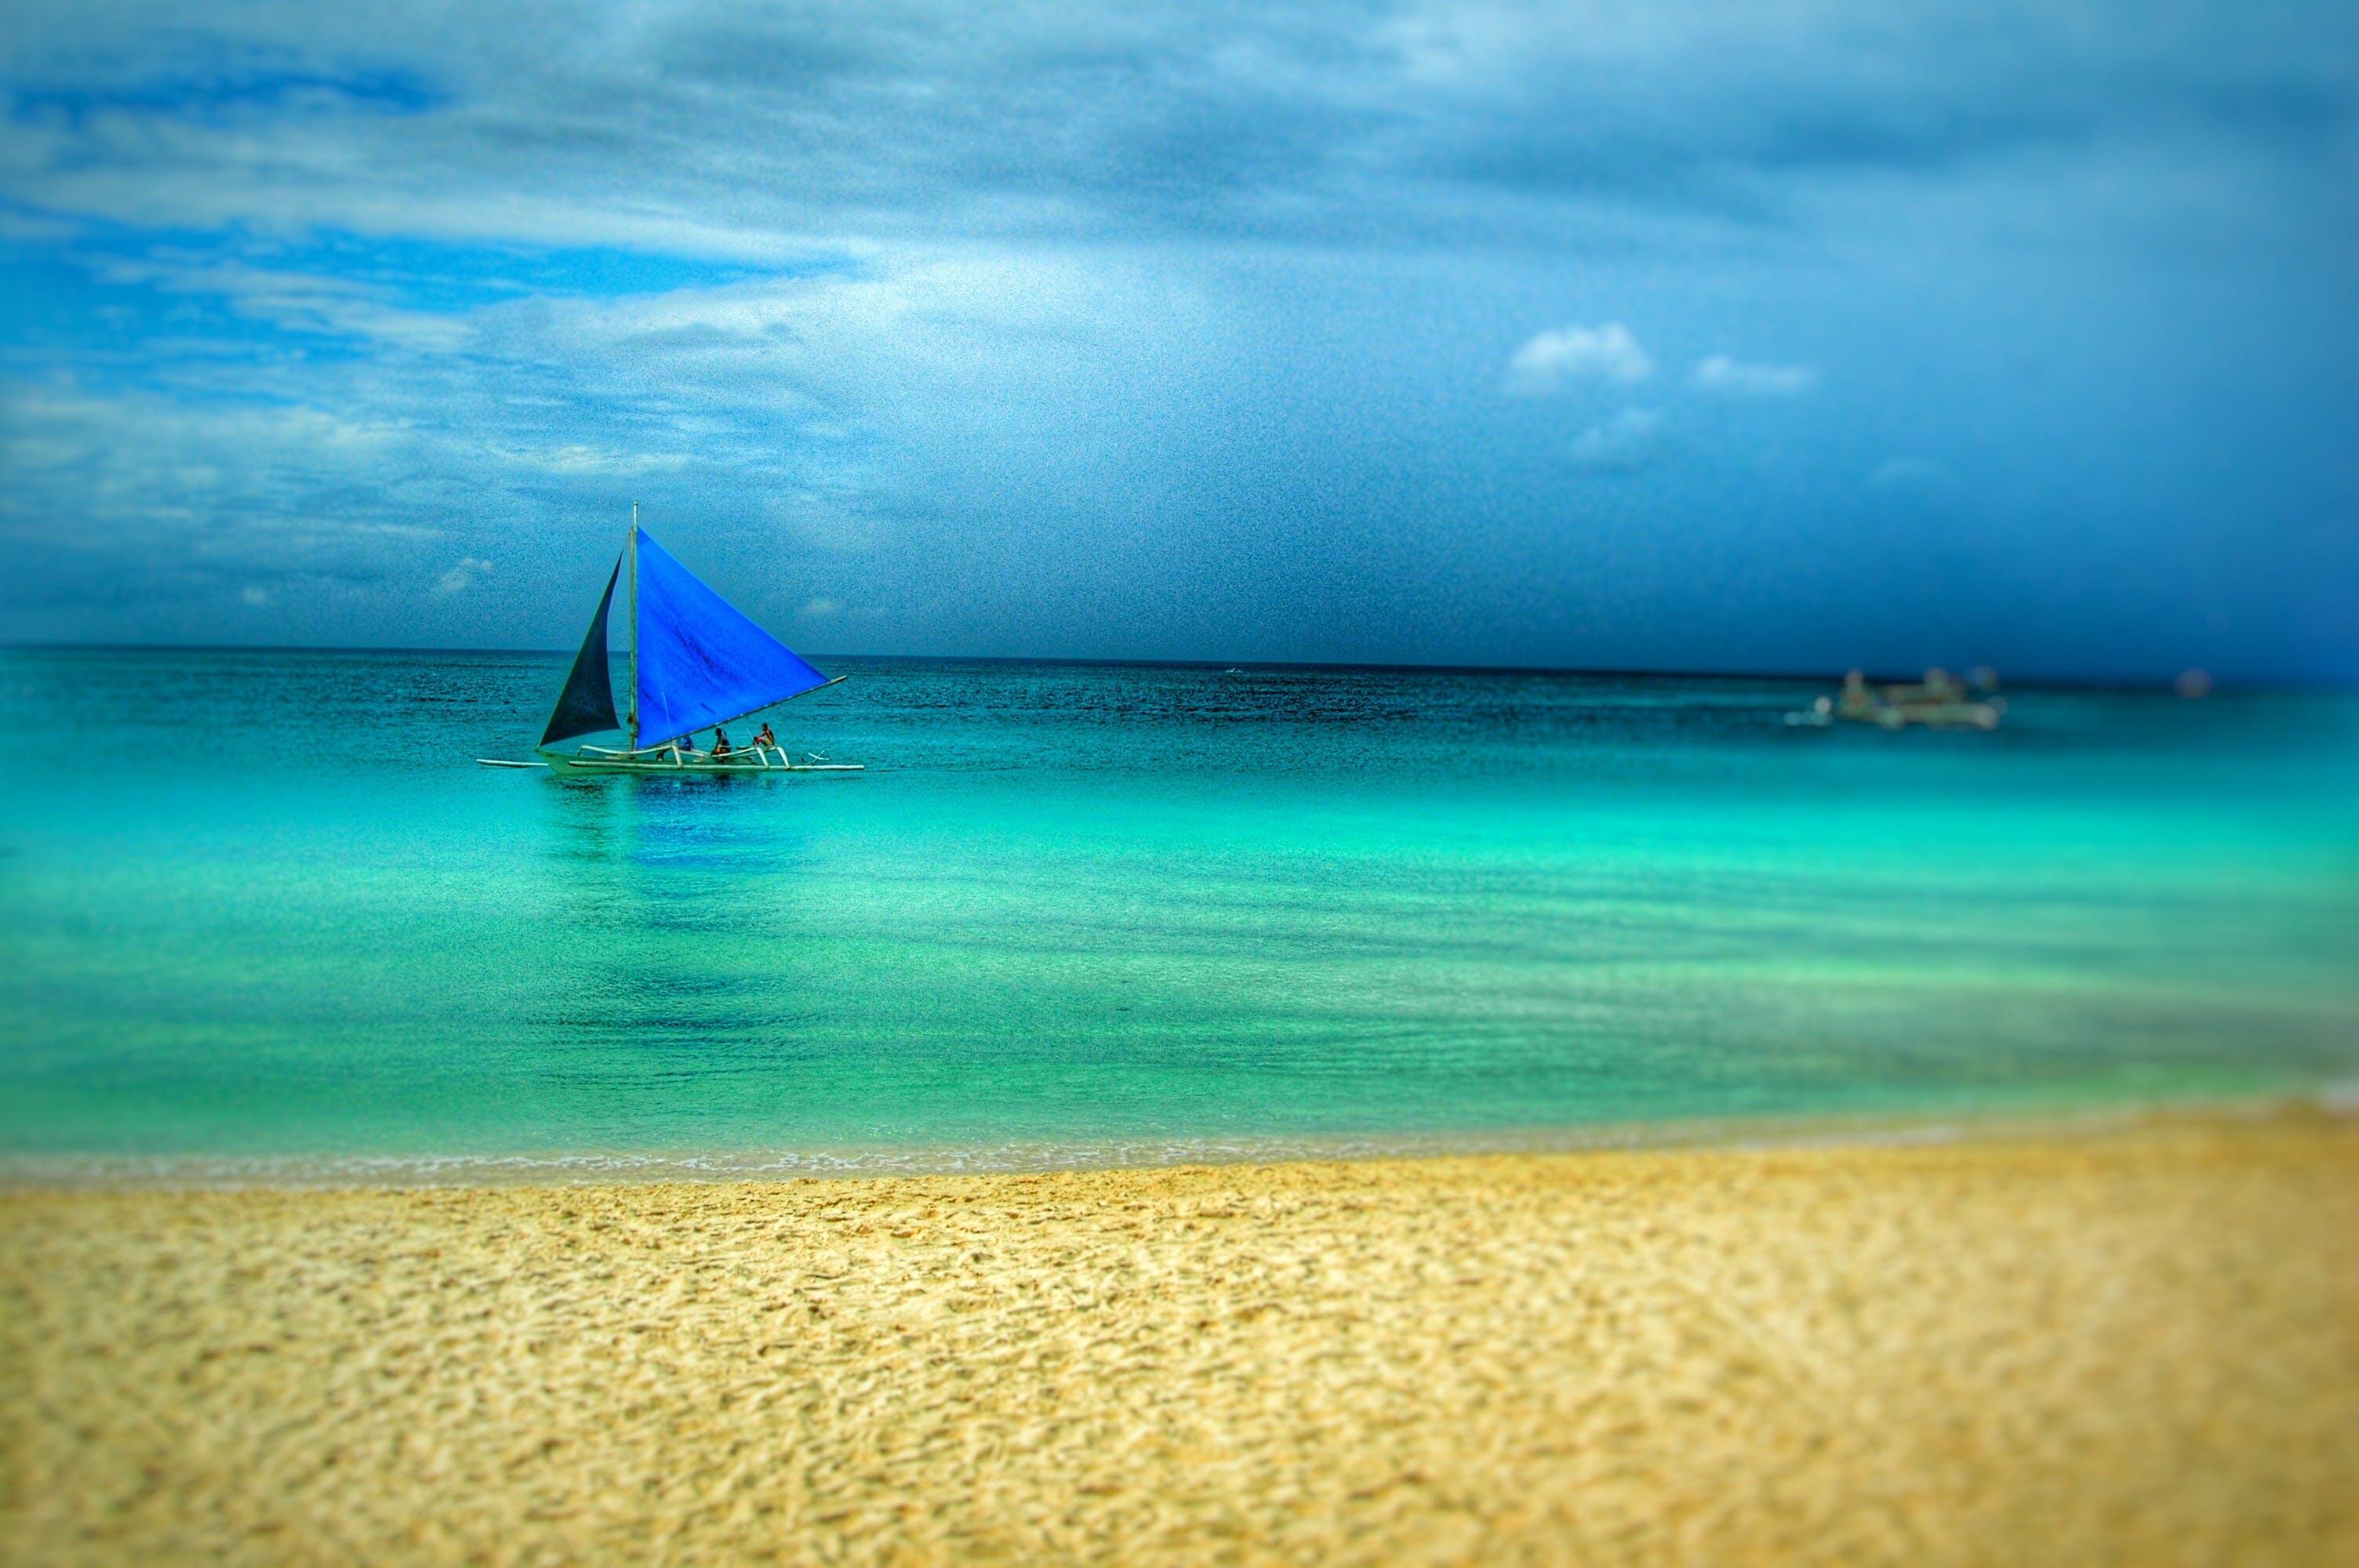 Kostenloses Stock Foto zu meer, ozean, sand, seelandschaft